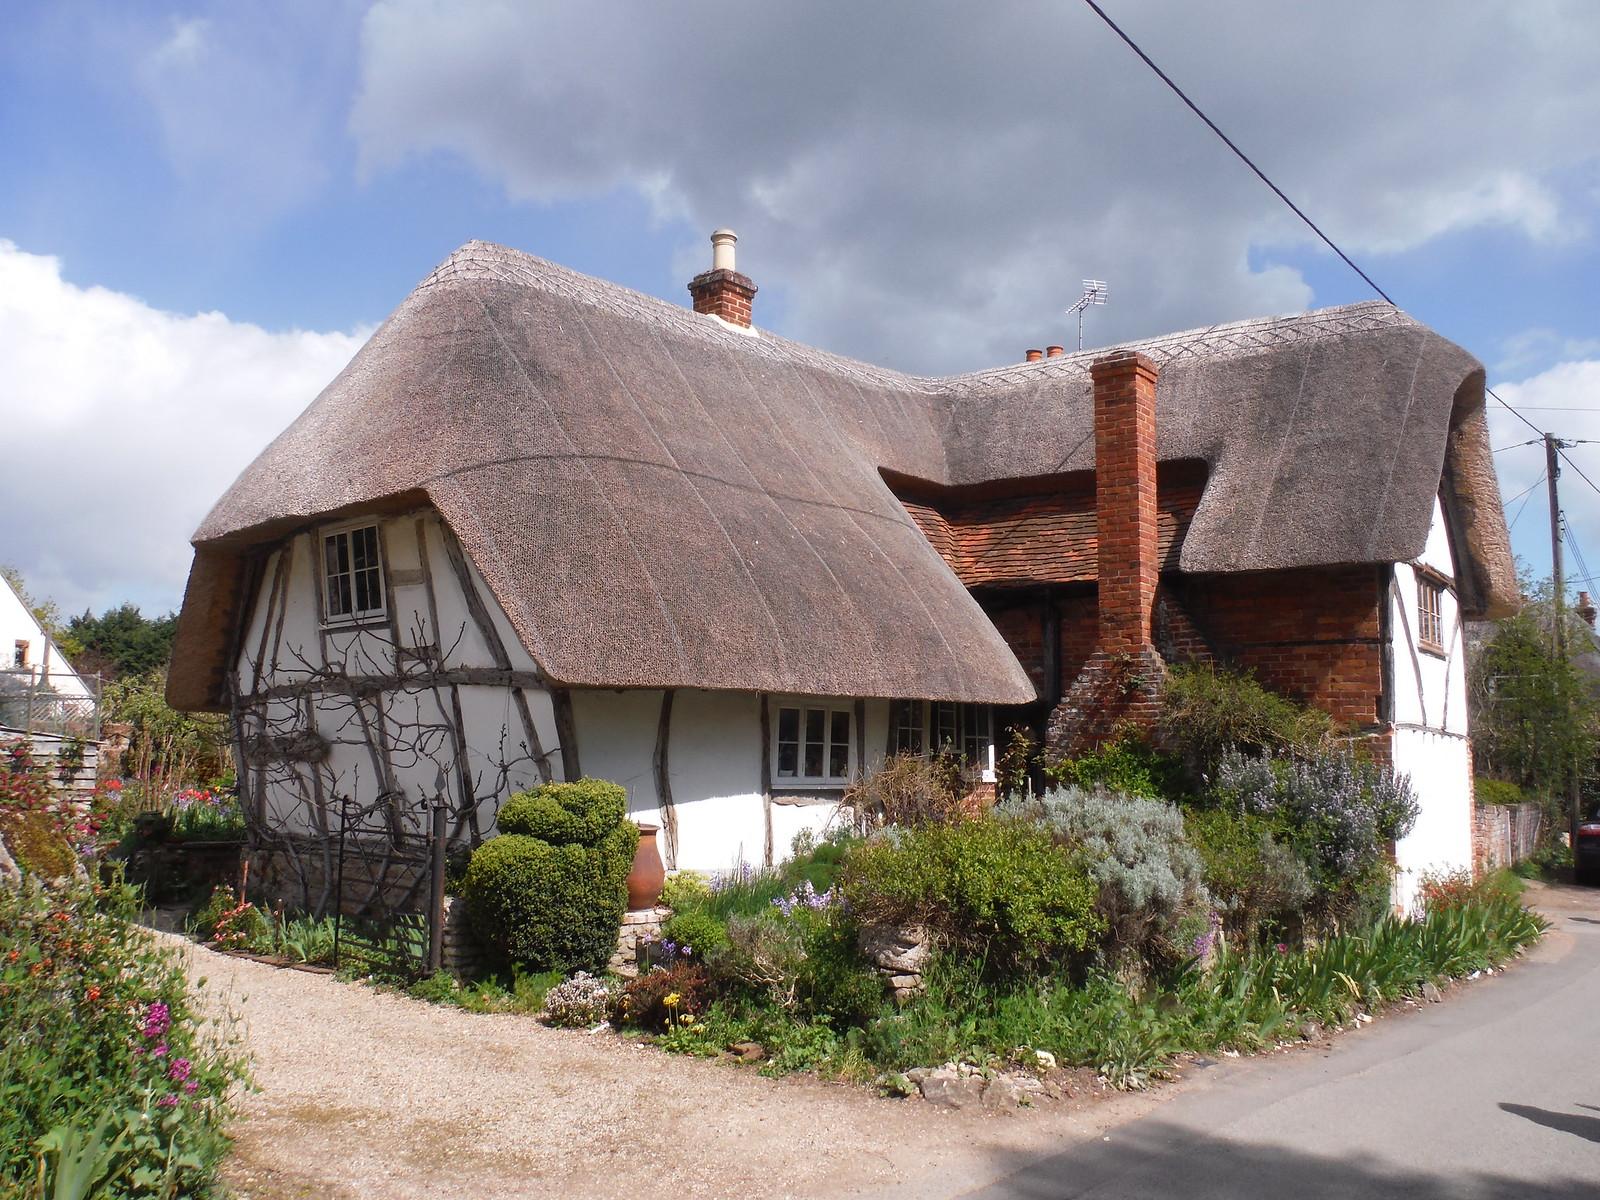 House in Long Wittenham SWC Walk 44 - Didcot Circular